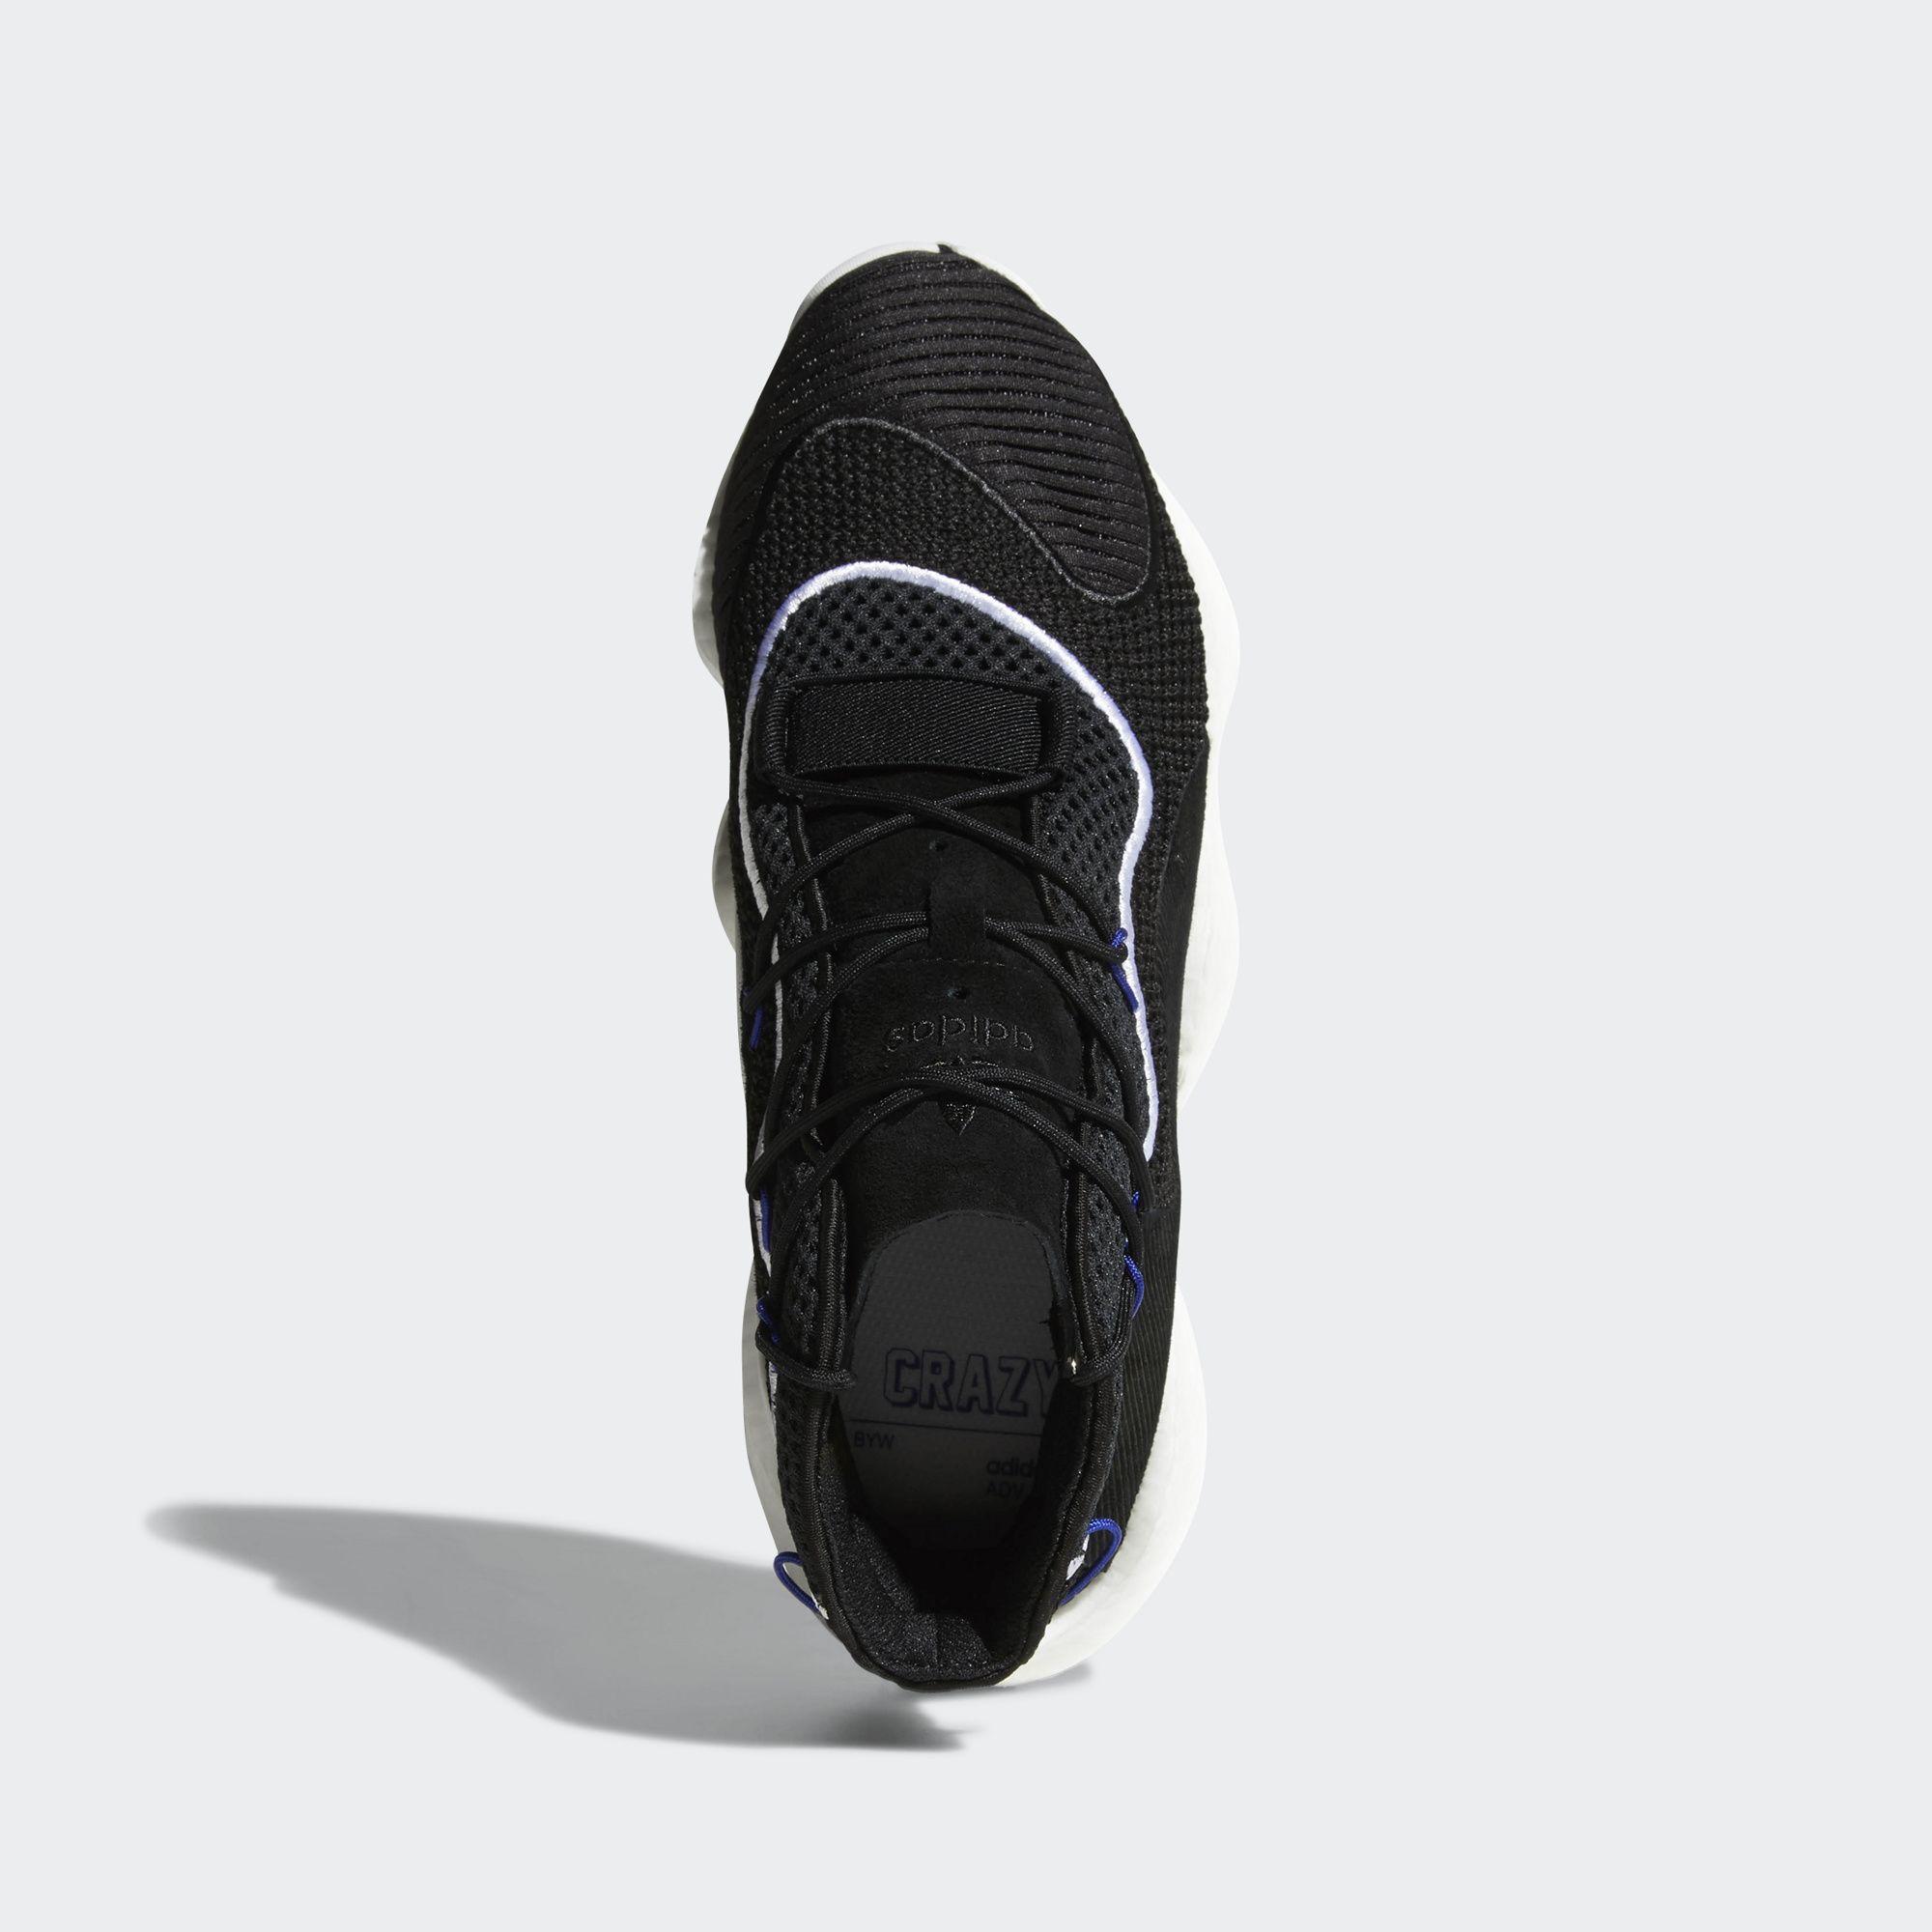 adidas,Crazy BYW LVL 1  时尚与性能并存!adidas 推出全新 Boost 篮球鞋!